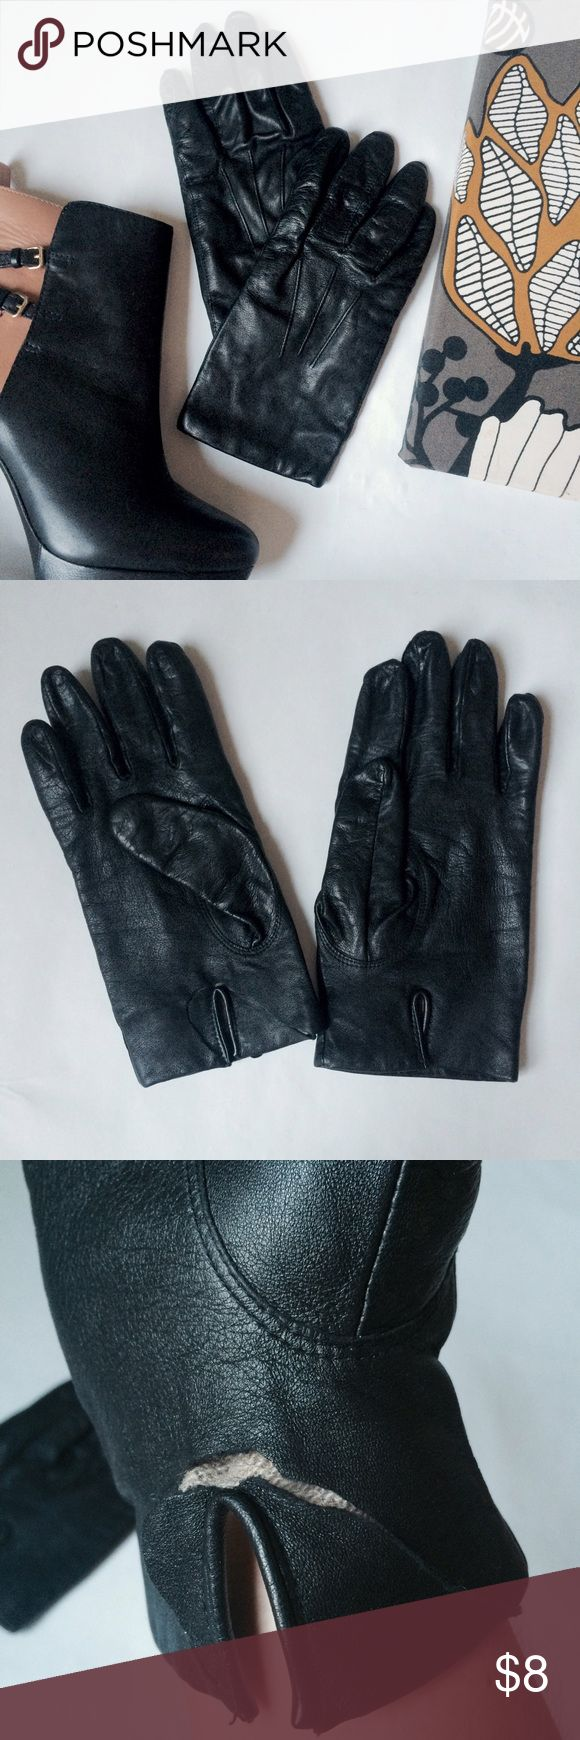 Womens black leather gloves medium - Black Leather Gloves Has Tear Inner Wrist